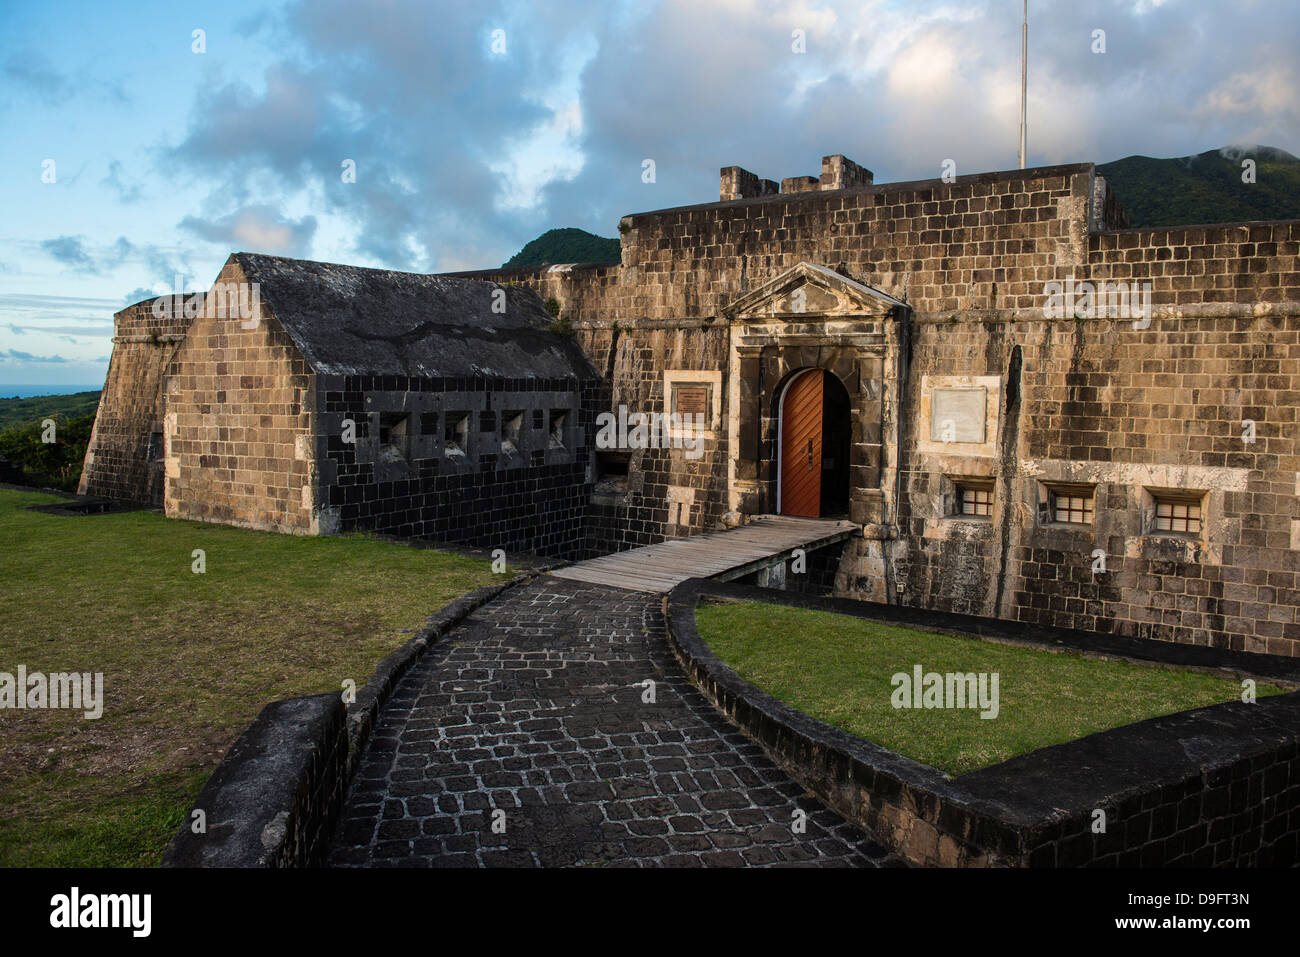 Brimstone Hill Fortress, UNESCO-Weltkulturerbe, St. Kitts, St. Kitts und Nevis, Leeward-Inseln, West Indies, Karibik Stockbild